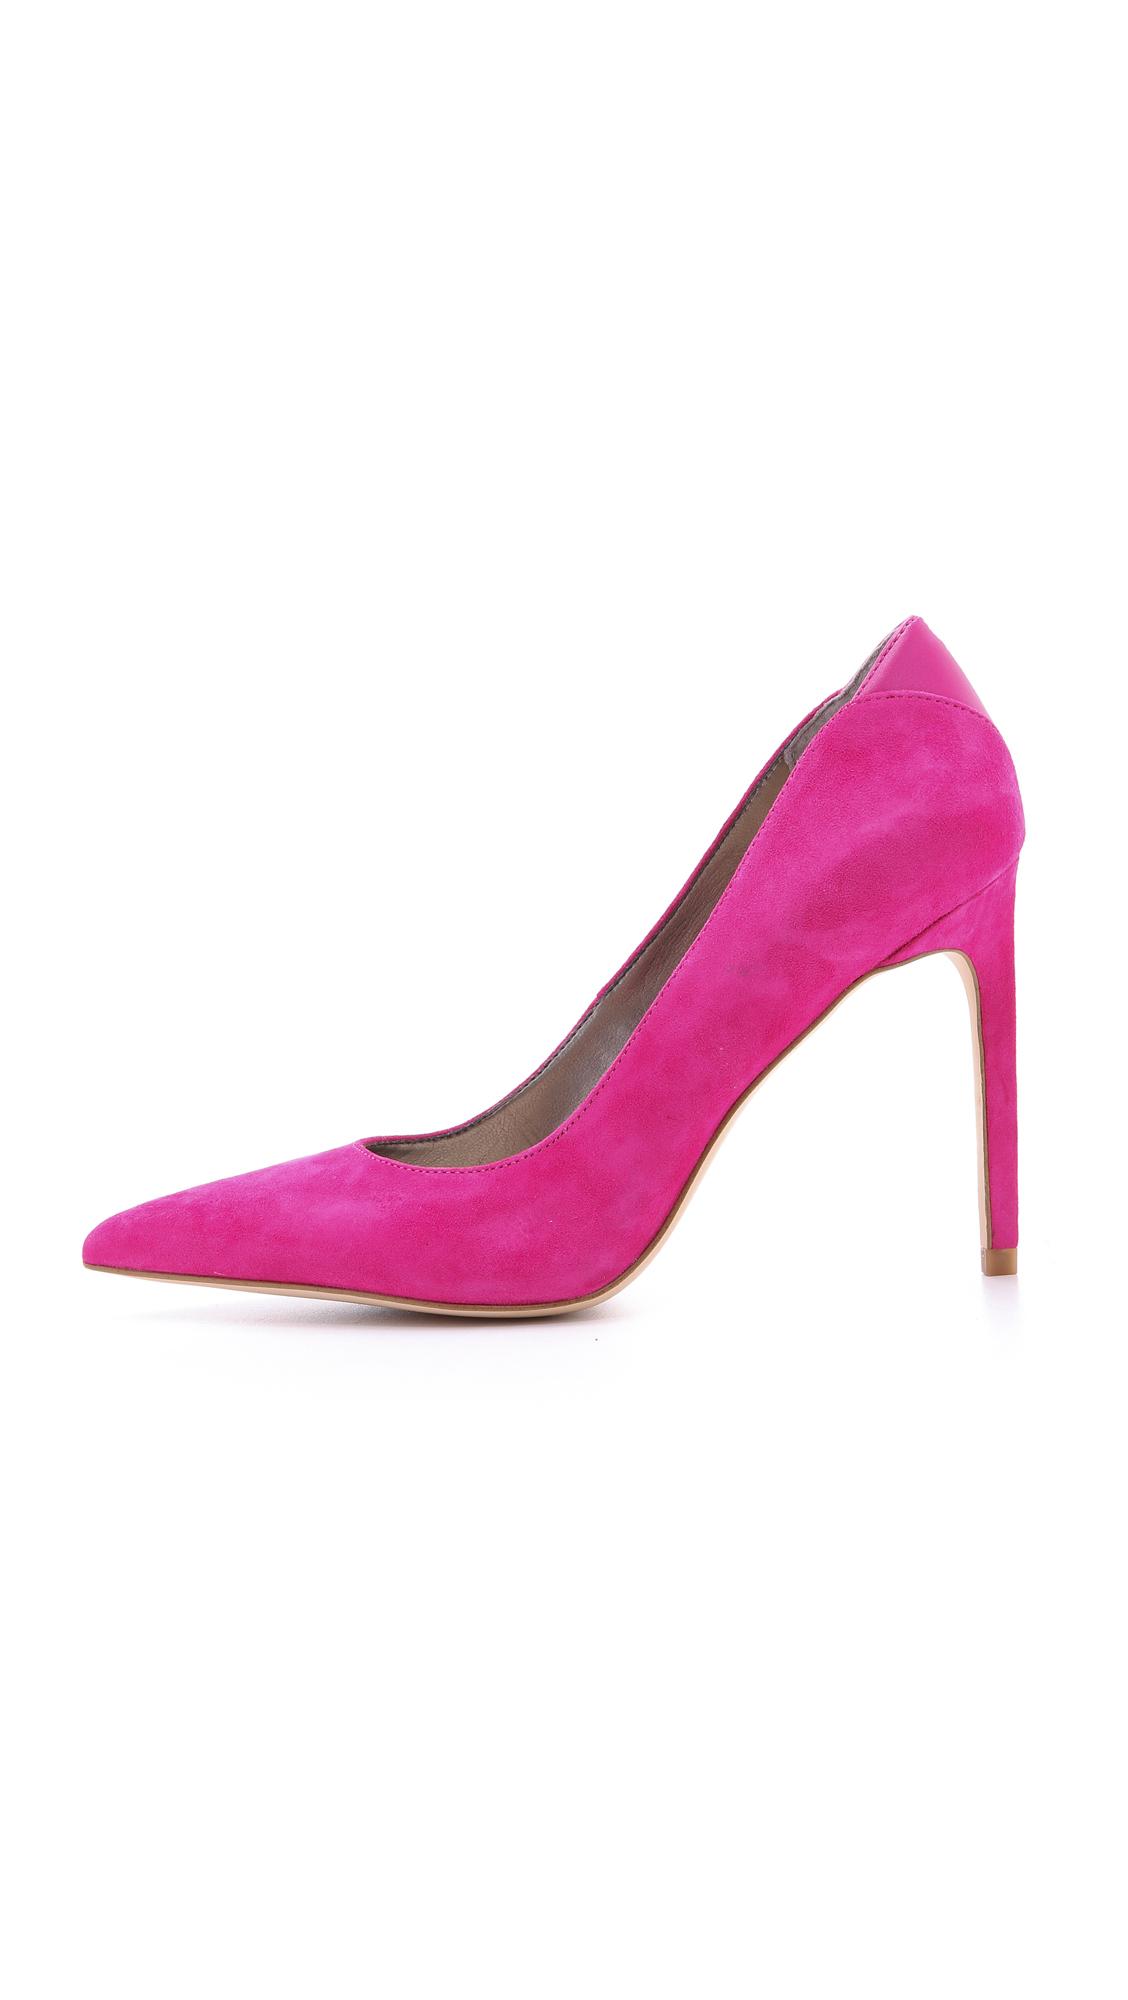 1b577c22c9035 Lyst - Sam Edelman Dea Suede Pumps - Black in Pink